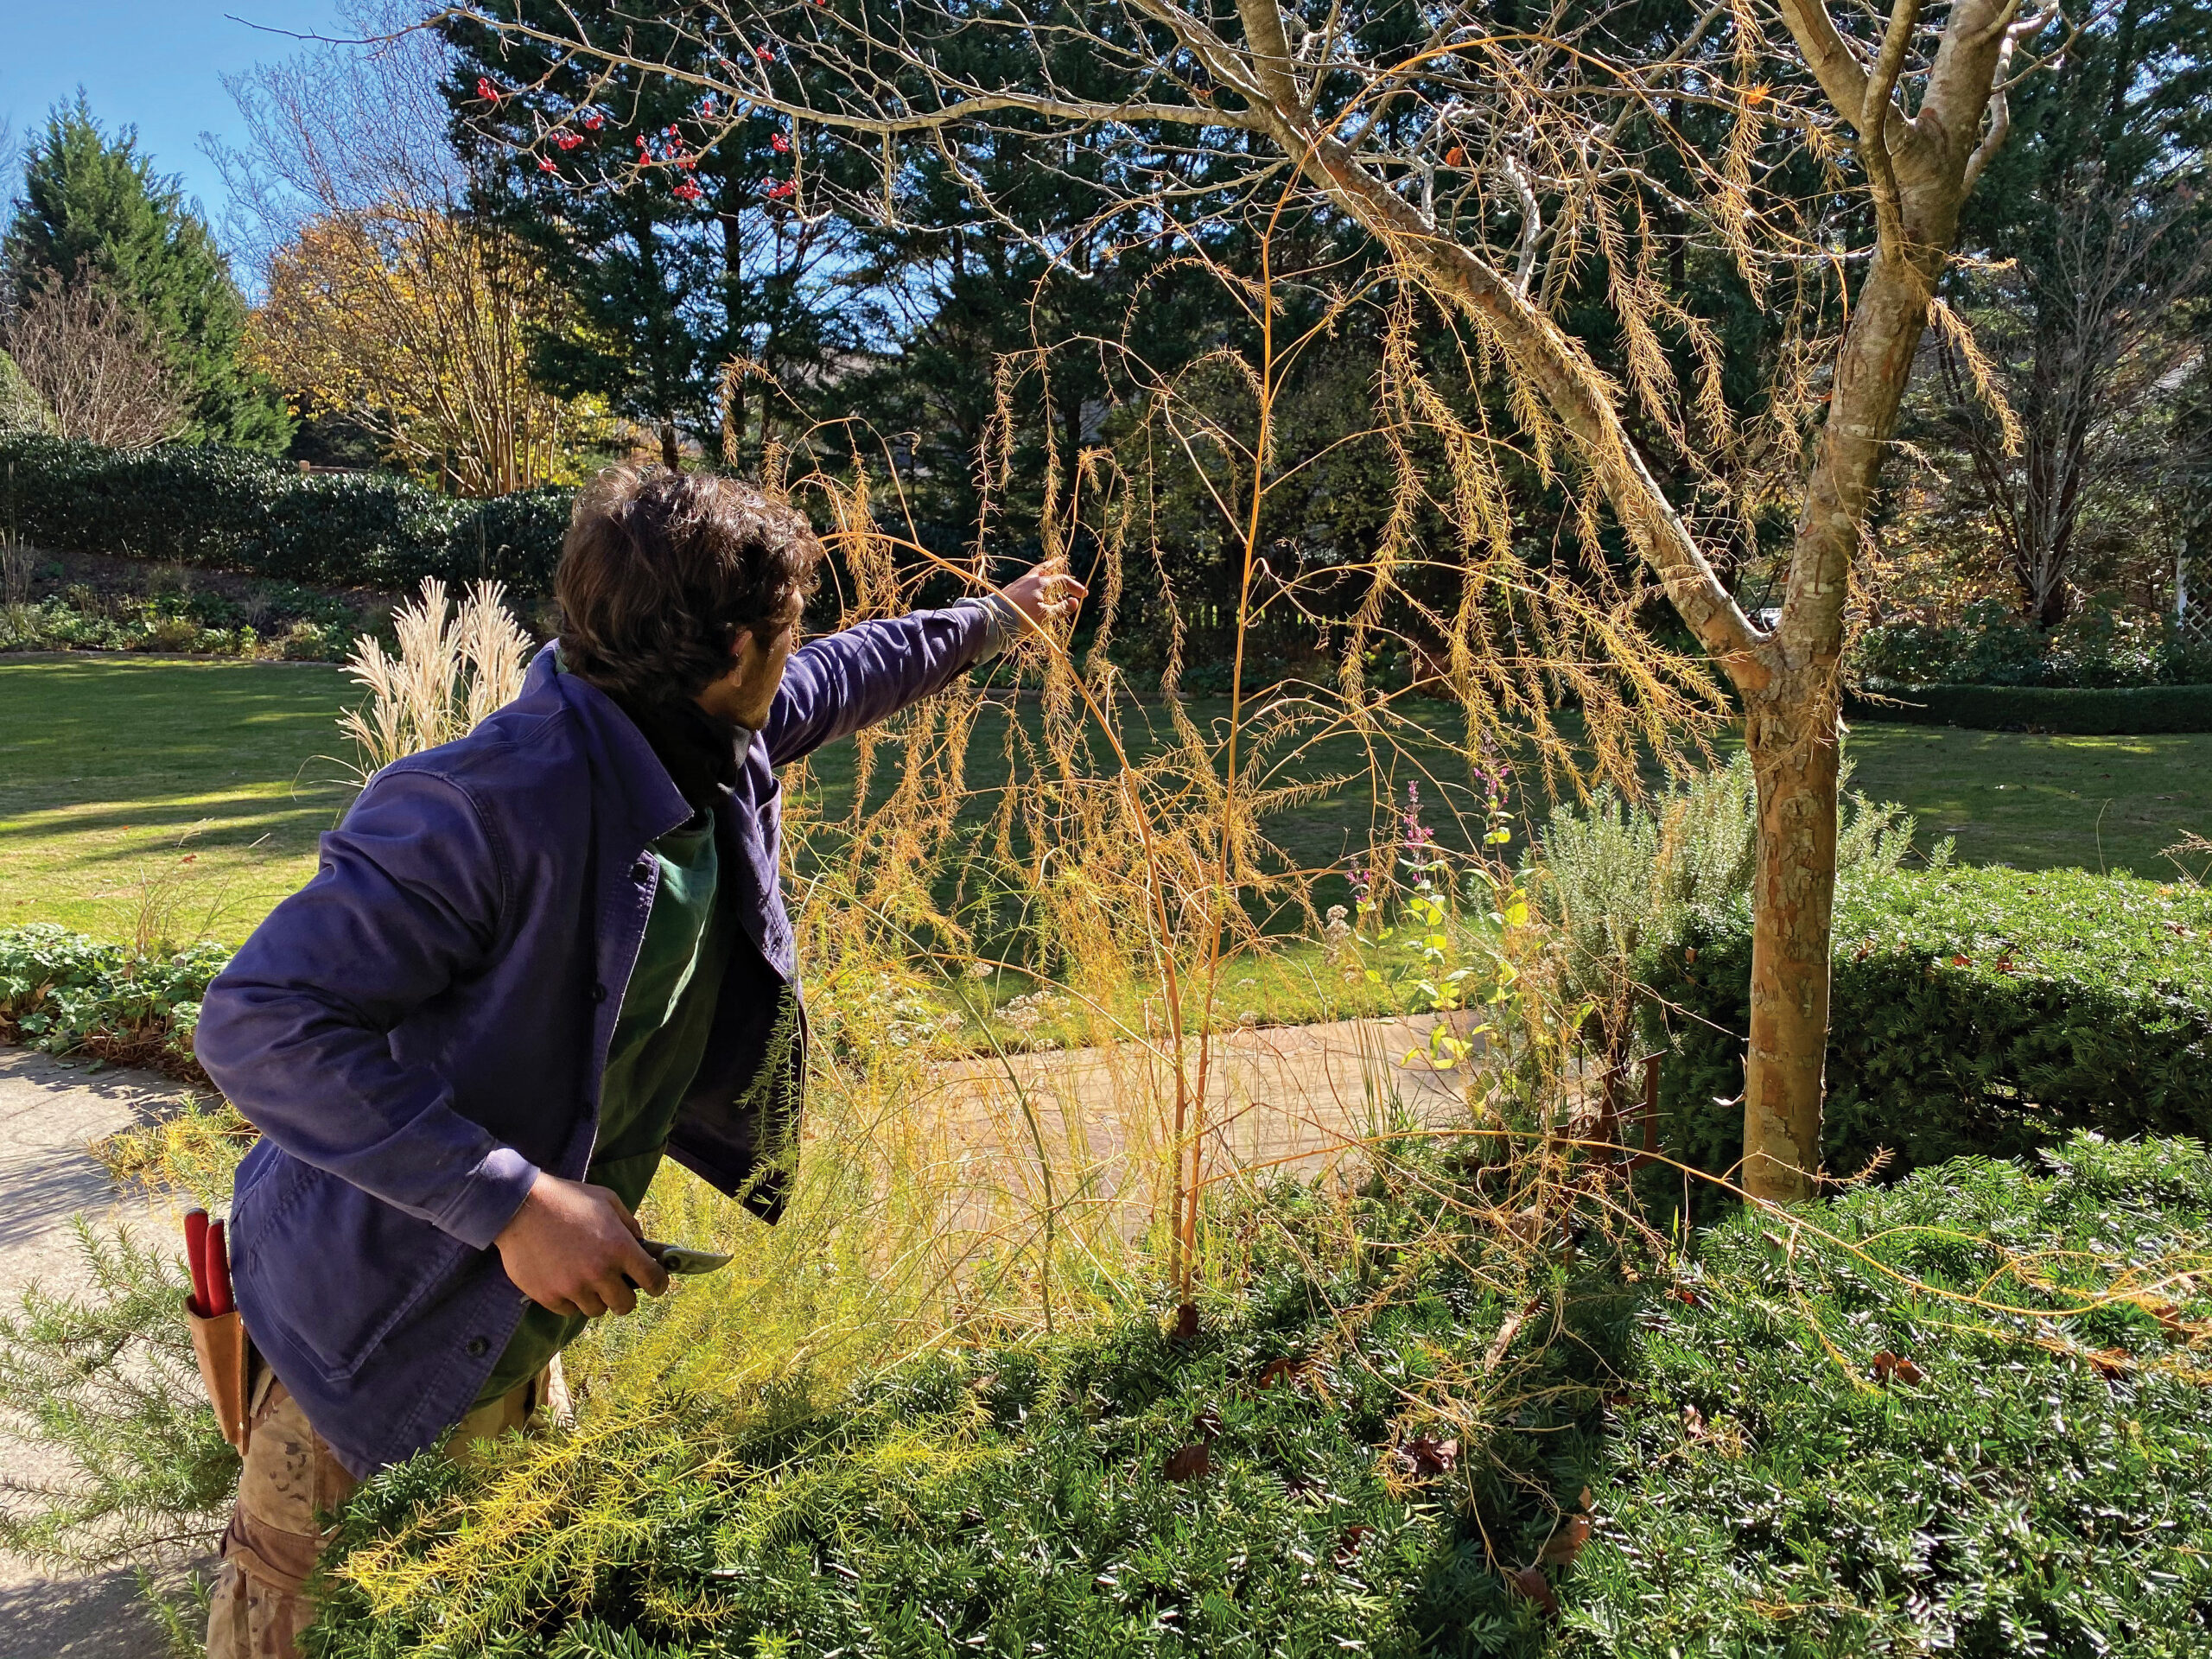 gardener pruning perennials in fall